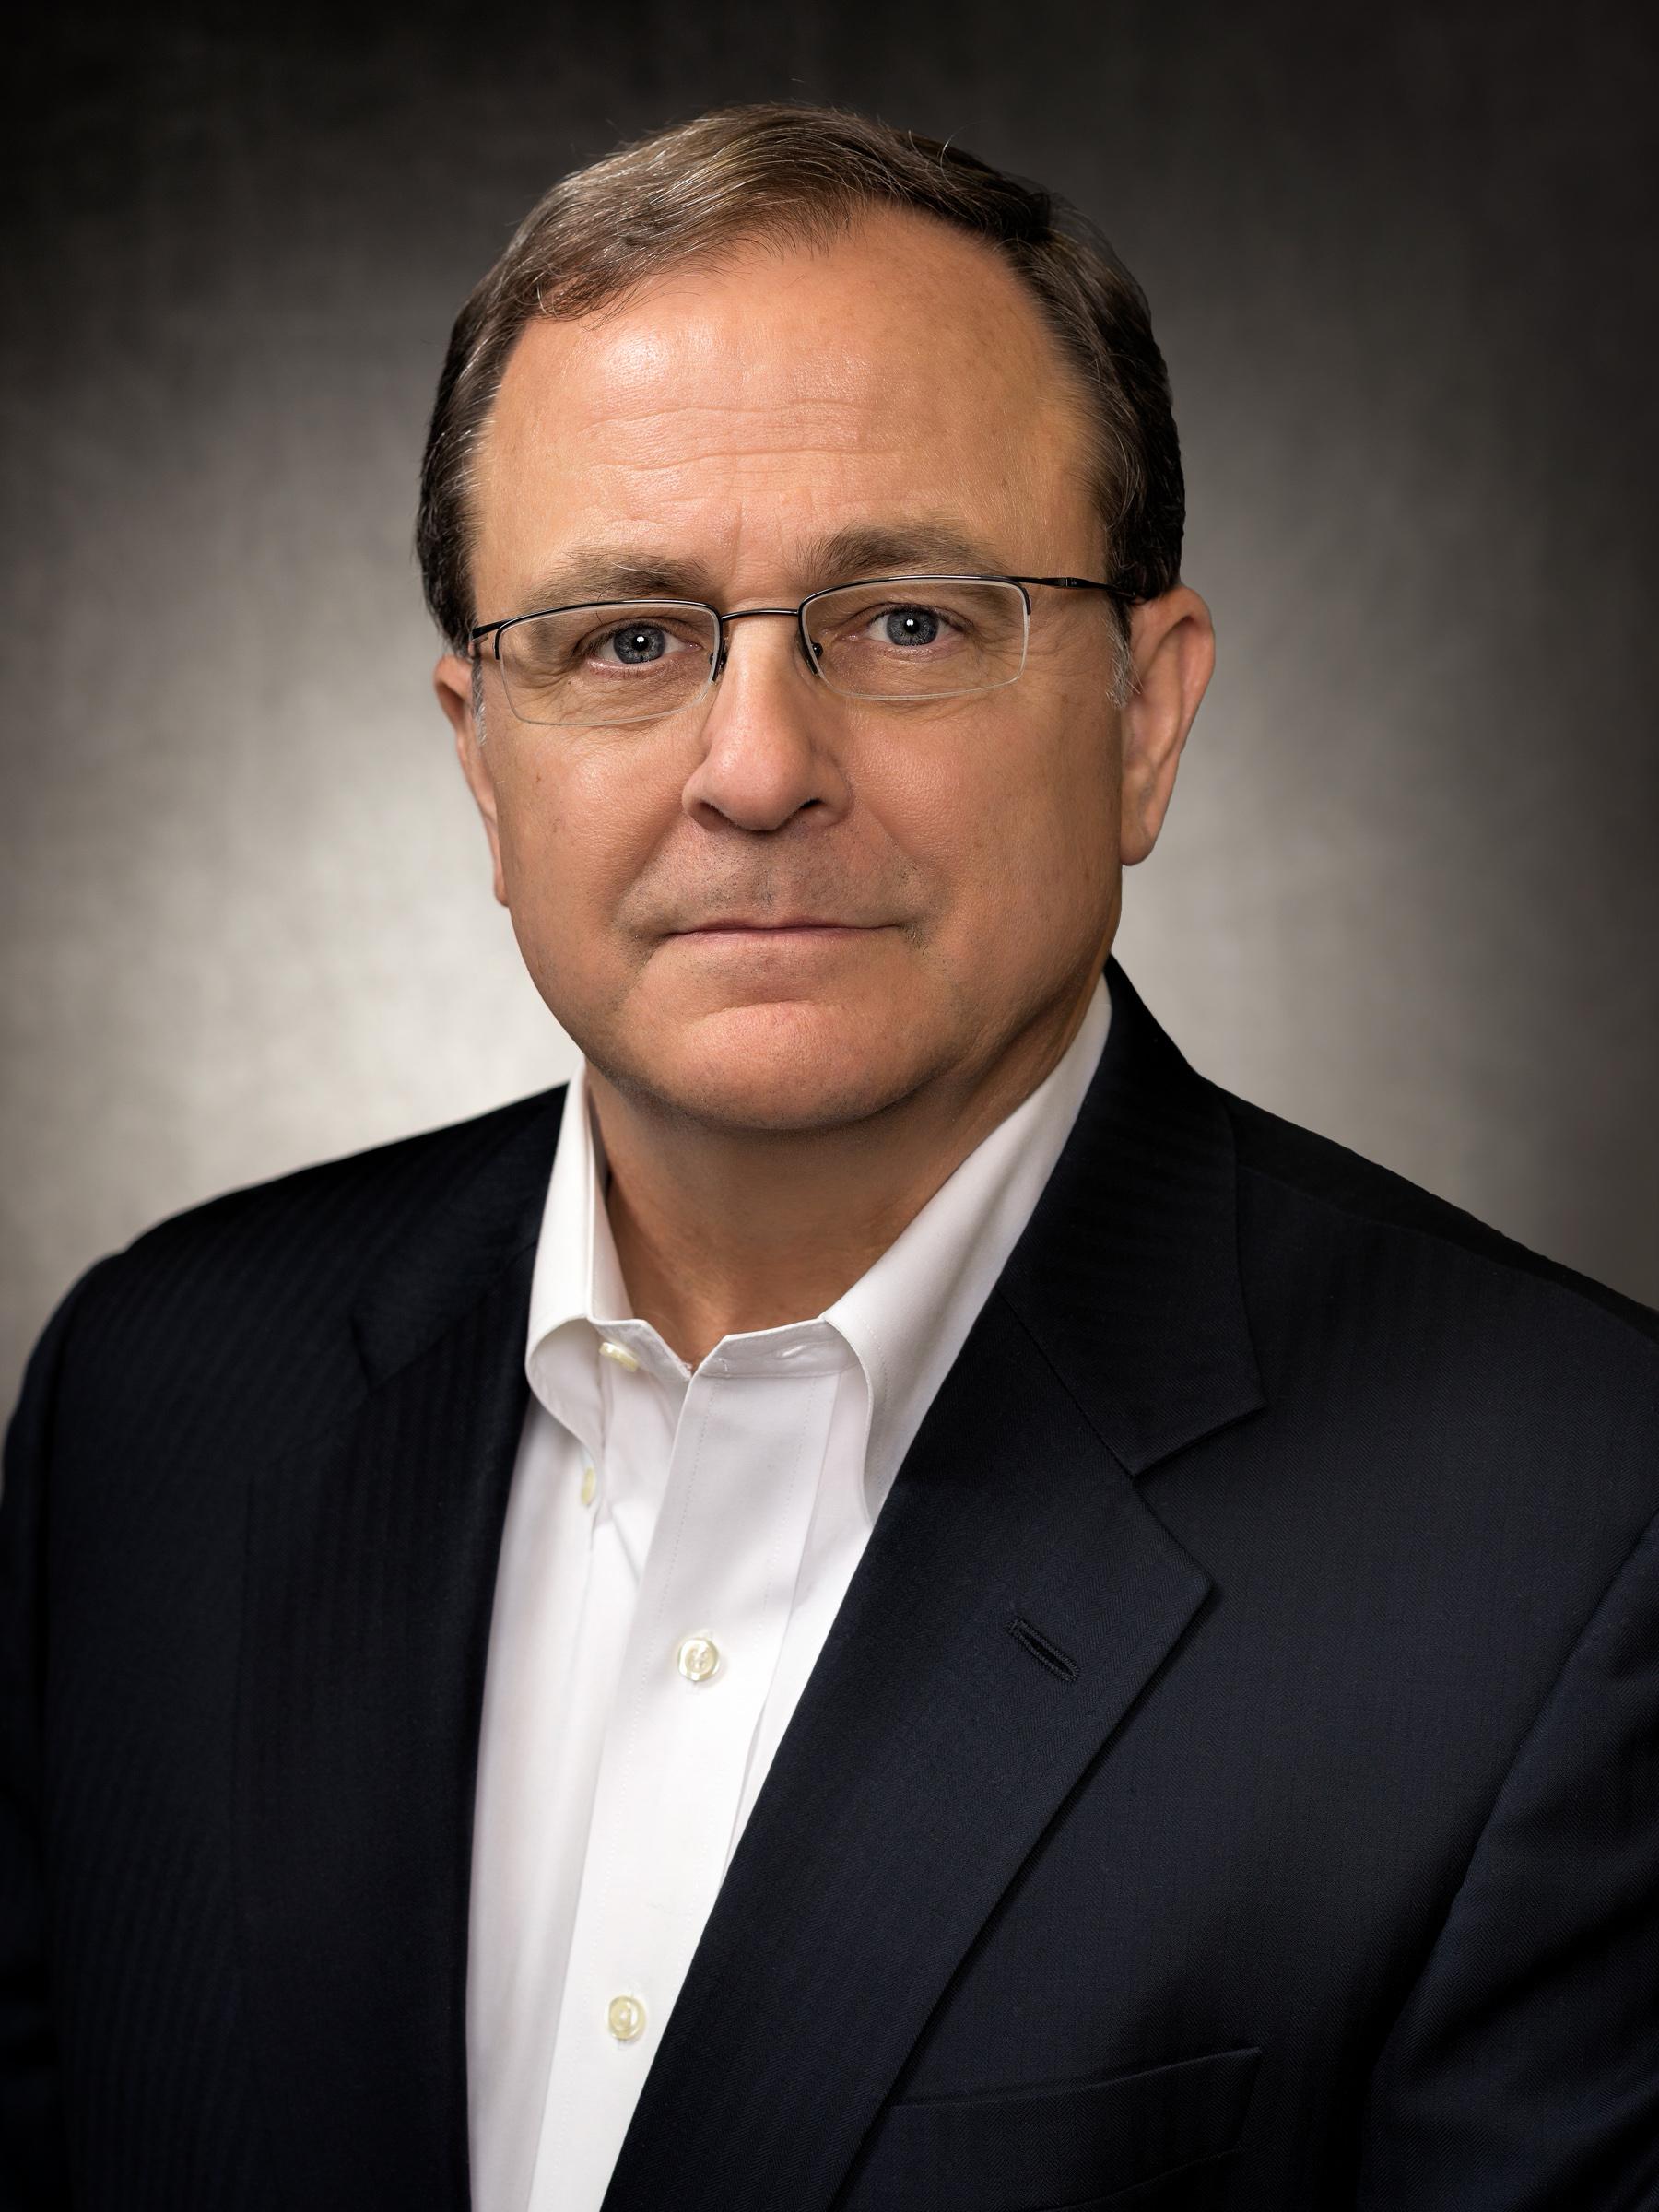 Mr. Mark Dancer, Owner, Channelvation Corp.